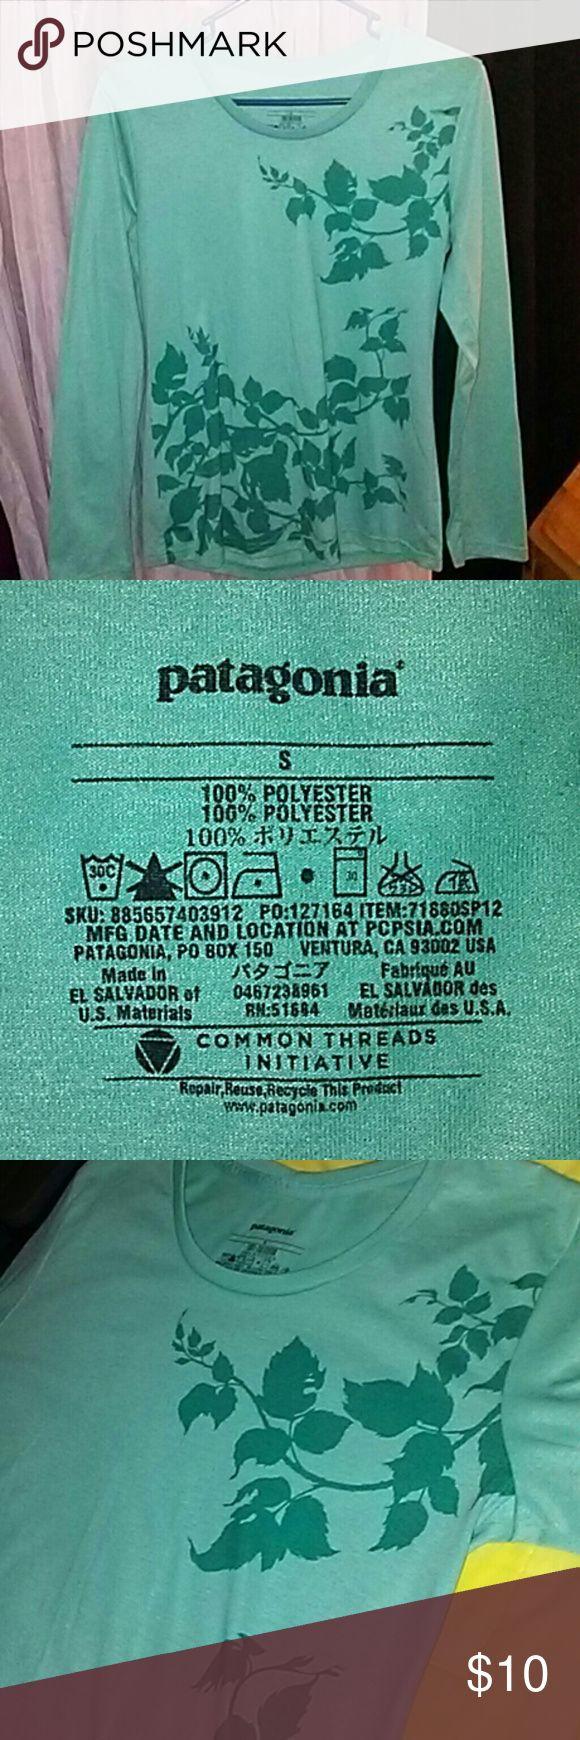 Patagonia shirt Aqua with floral detail Patagonia Tops Tees - Long Sleeve